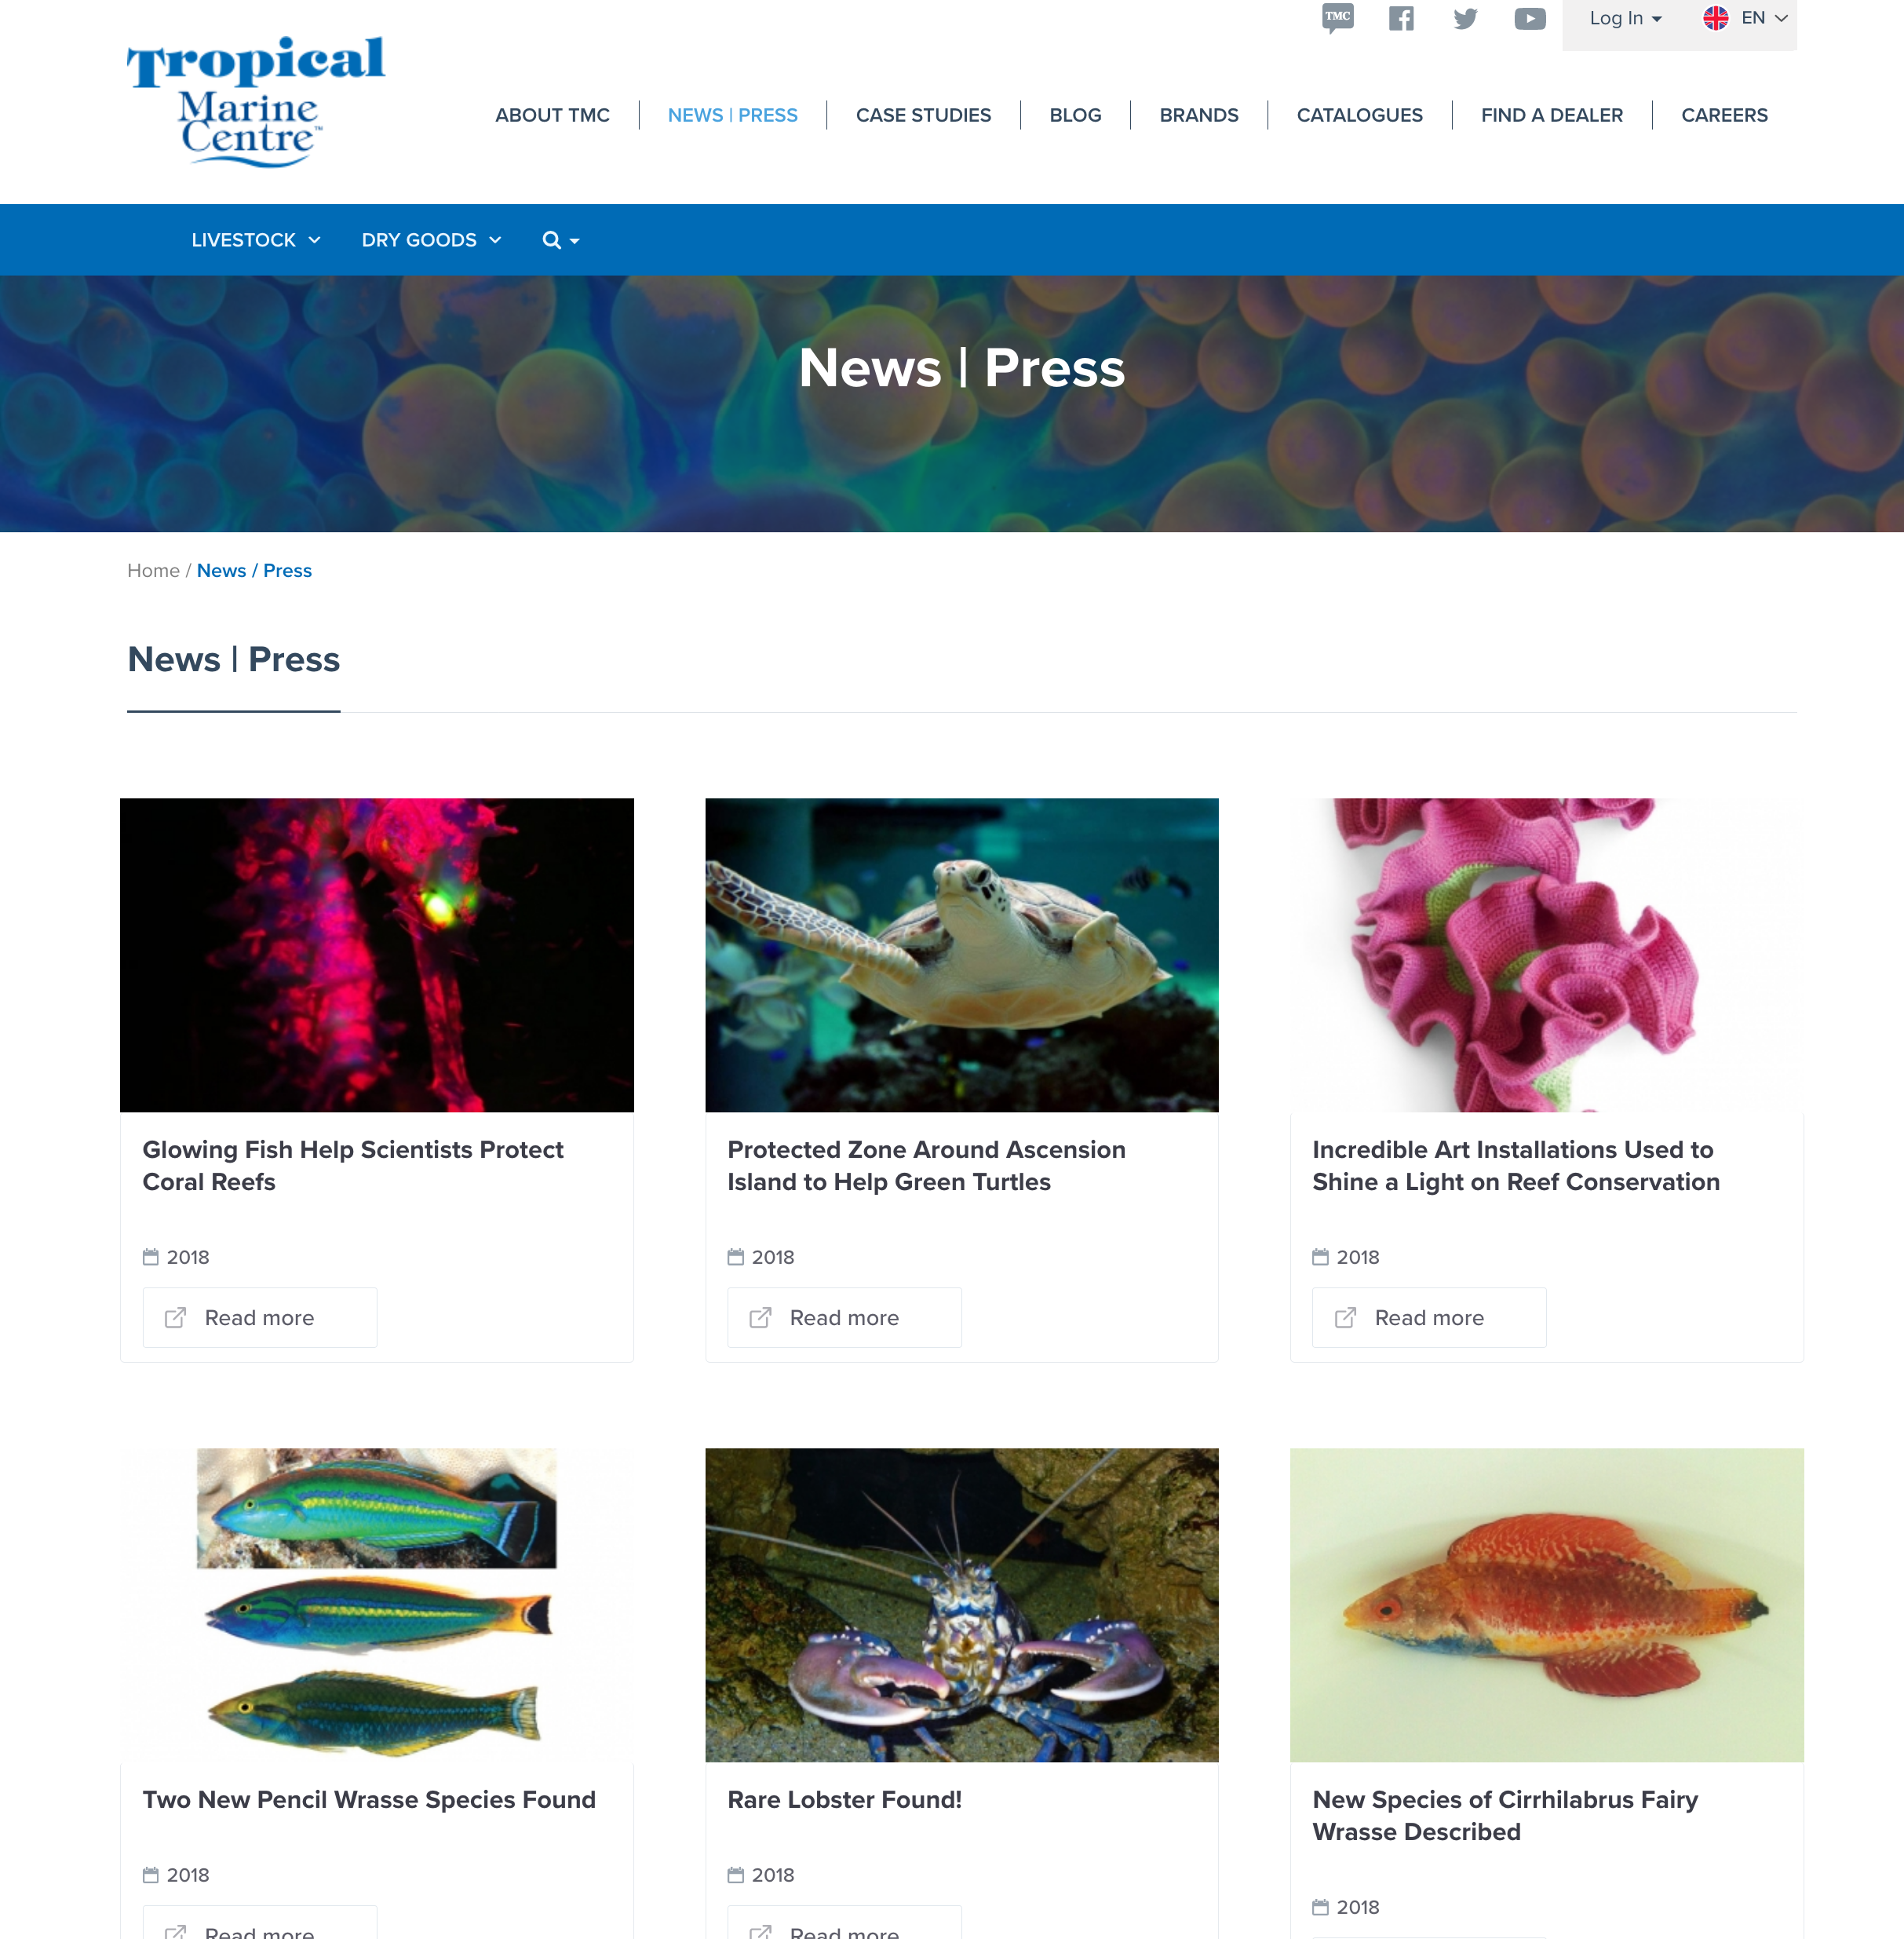 Tropical Marine Centre News Page